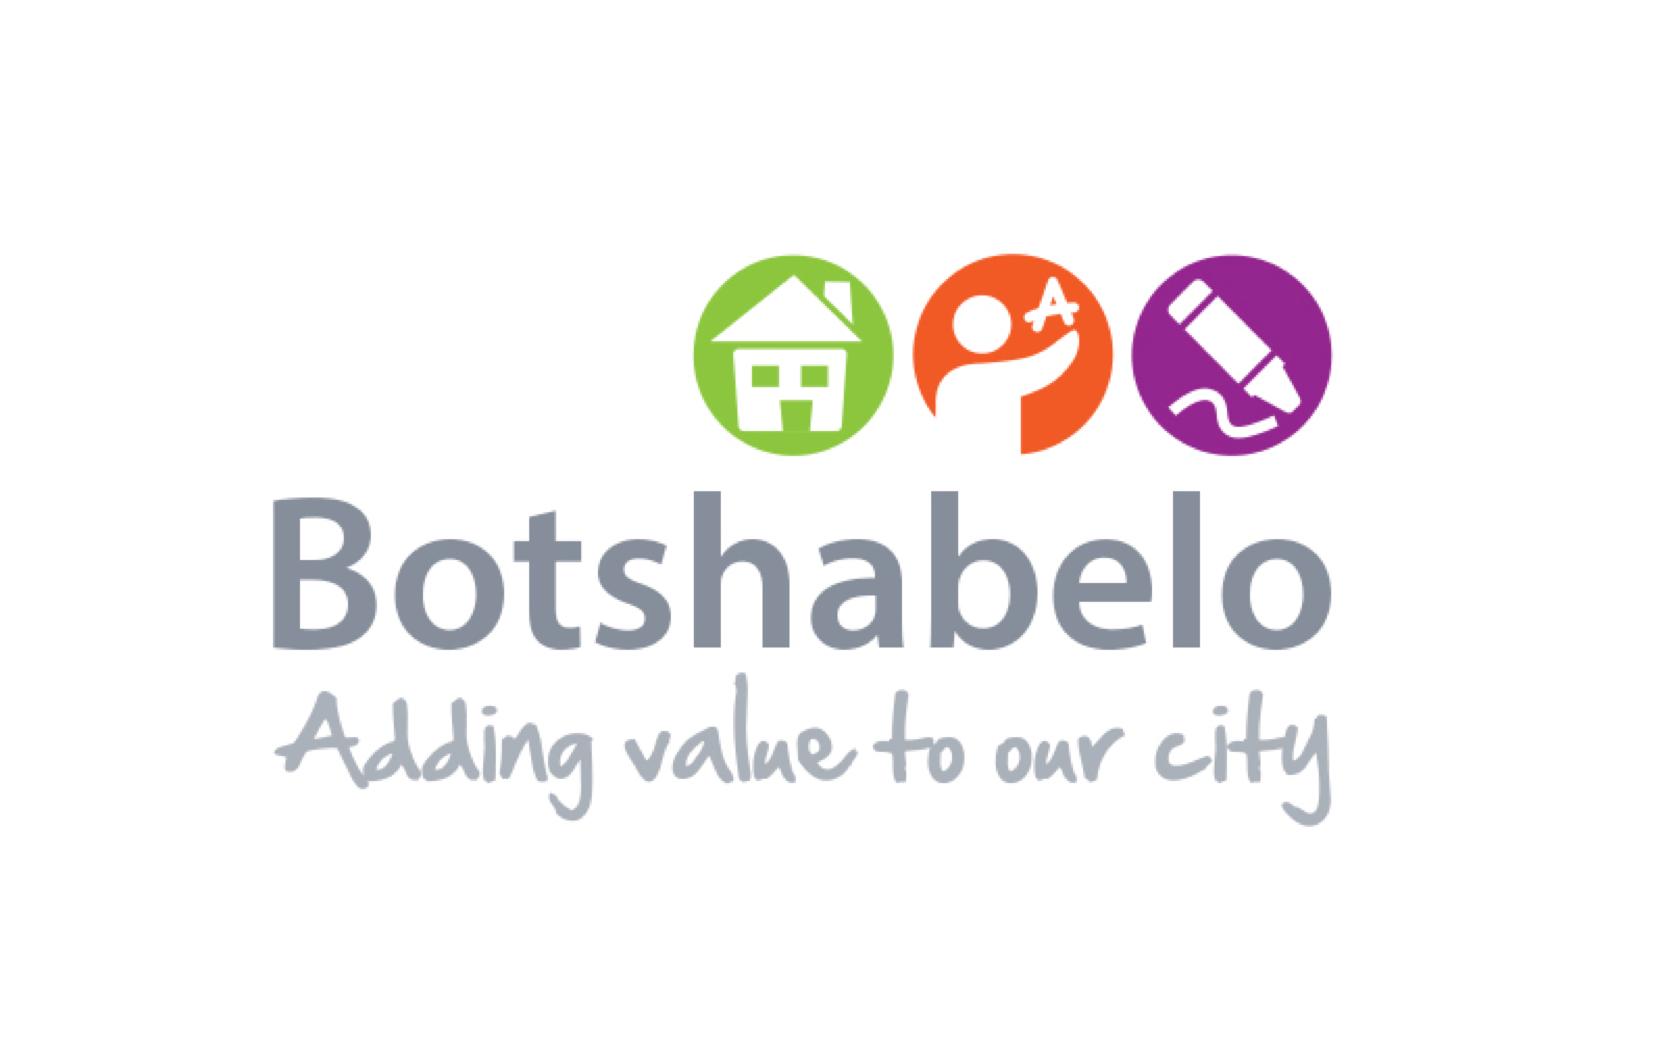 Please List Links To Your Website And Social Media Platforms Here Botshabelo Twitter Facebook Describe In Detail What Social Media Platforms Social Media Life